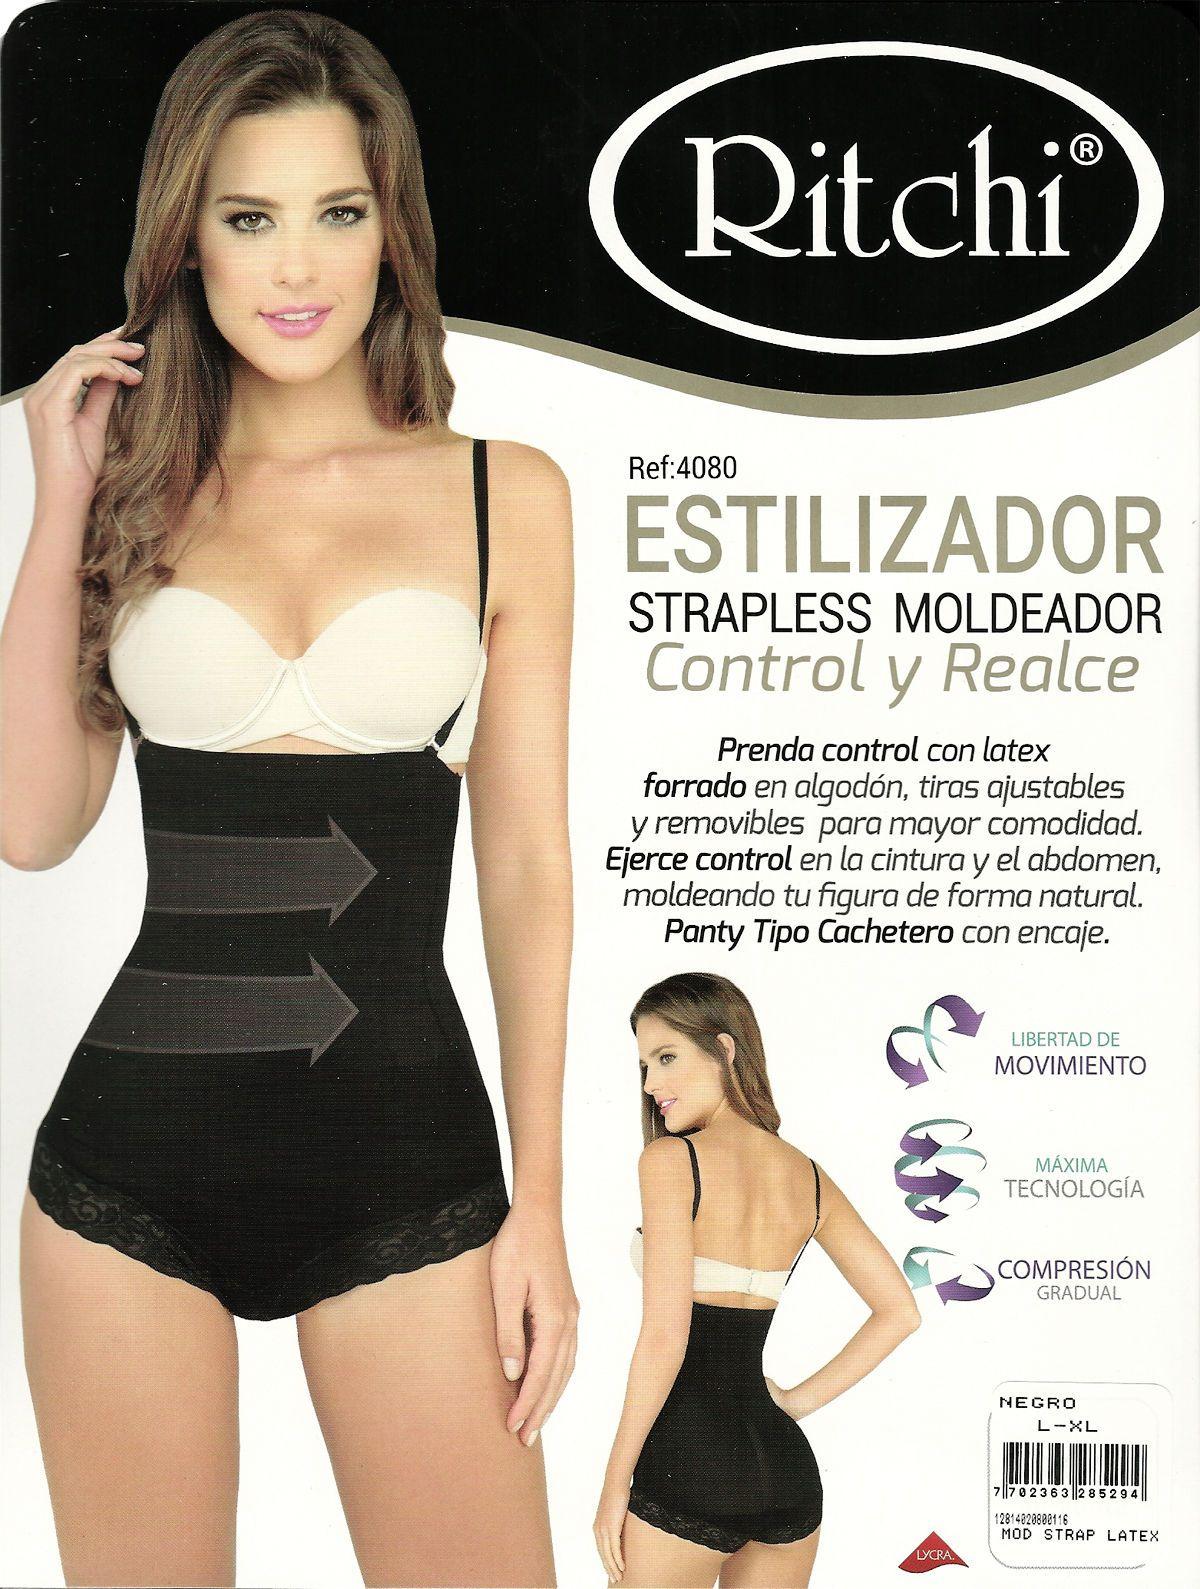 d7f0a741c1 Panty Faja Reductora Cachetera Strapless Moldea Reduce Cintura Estómago  Ritchi…